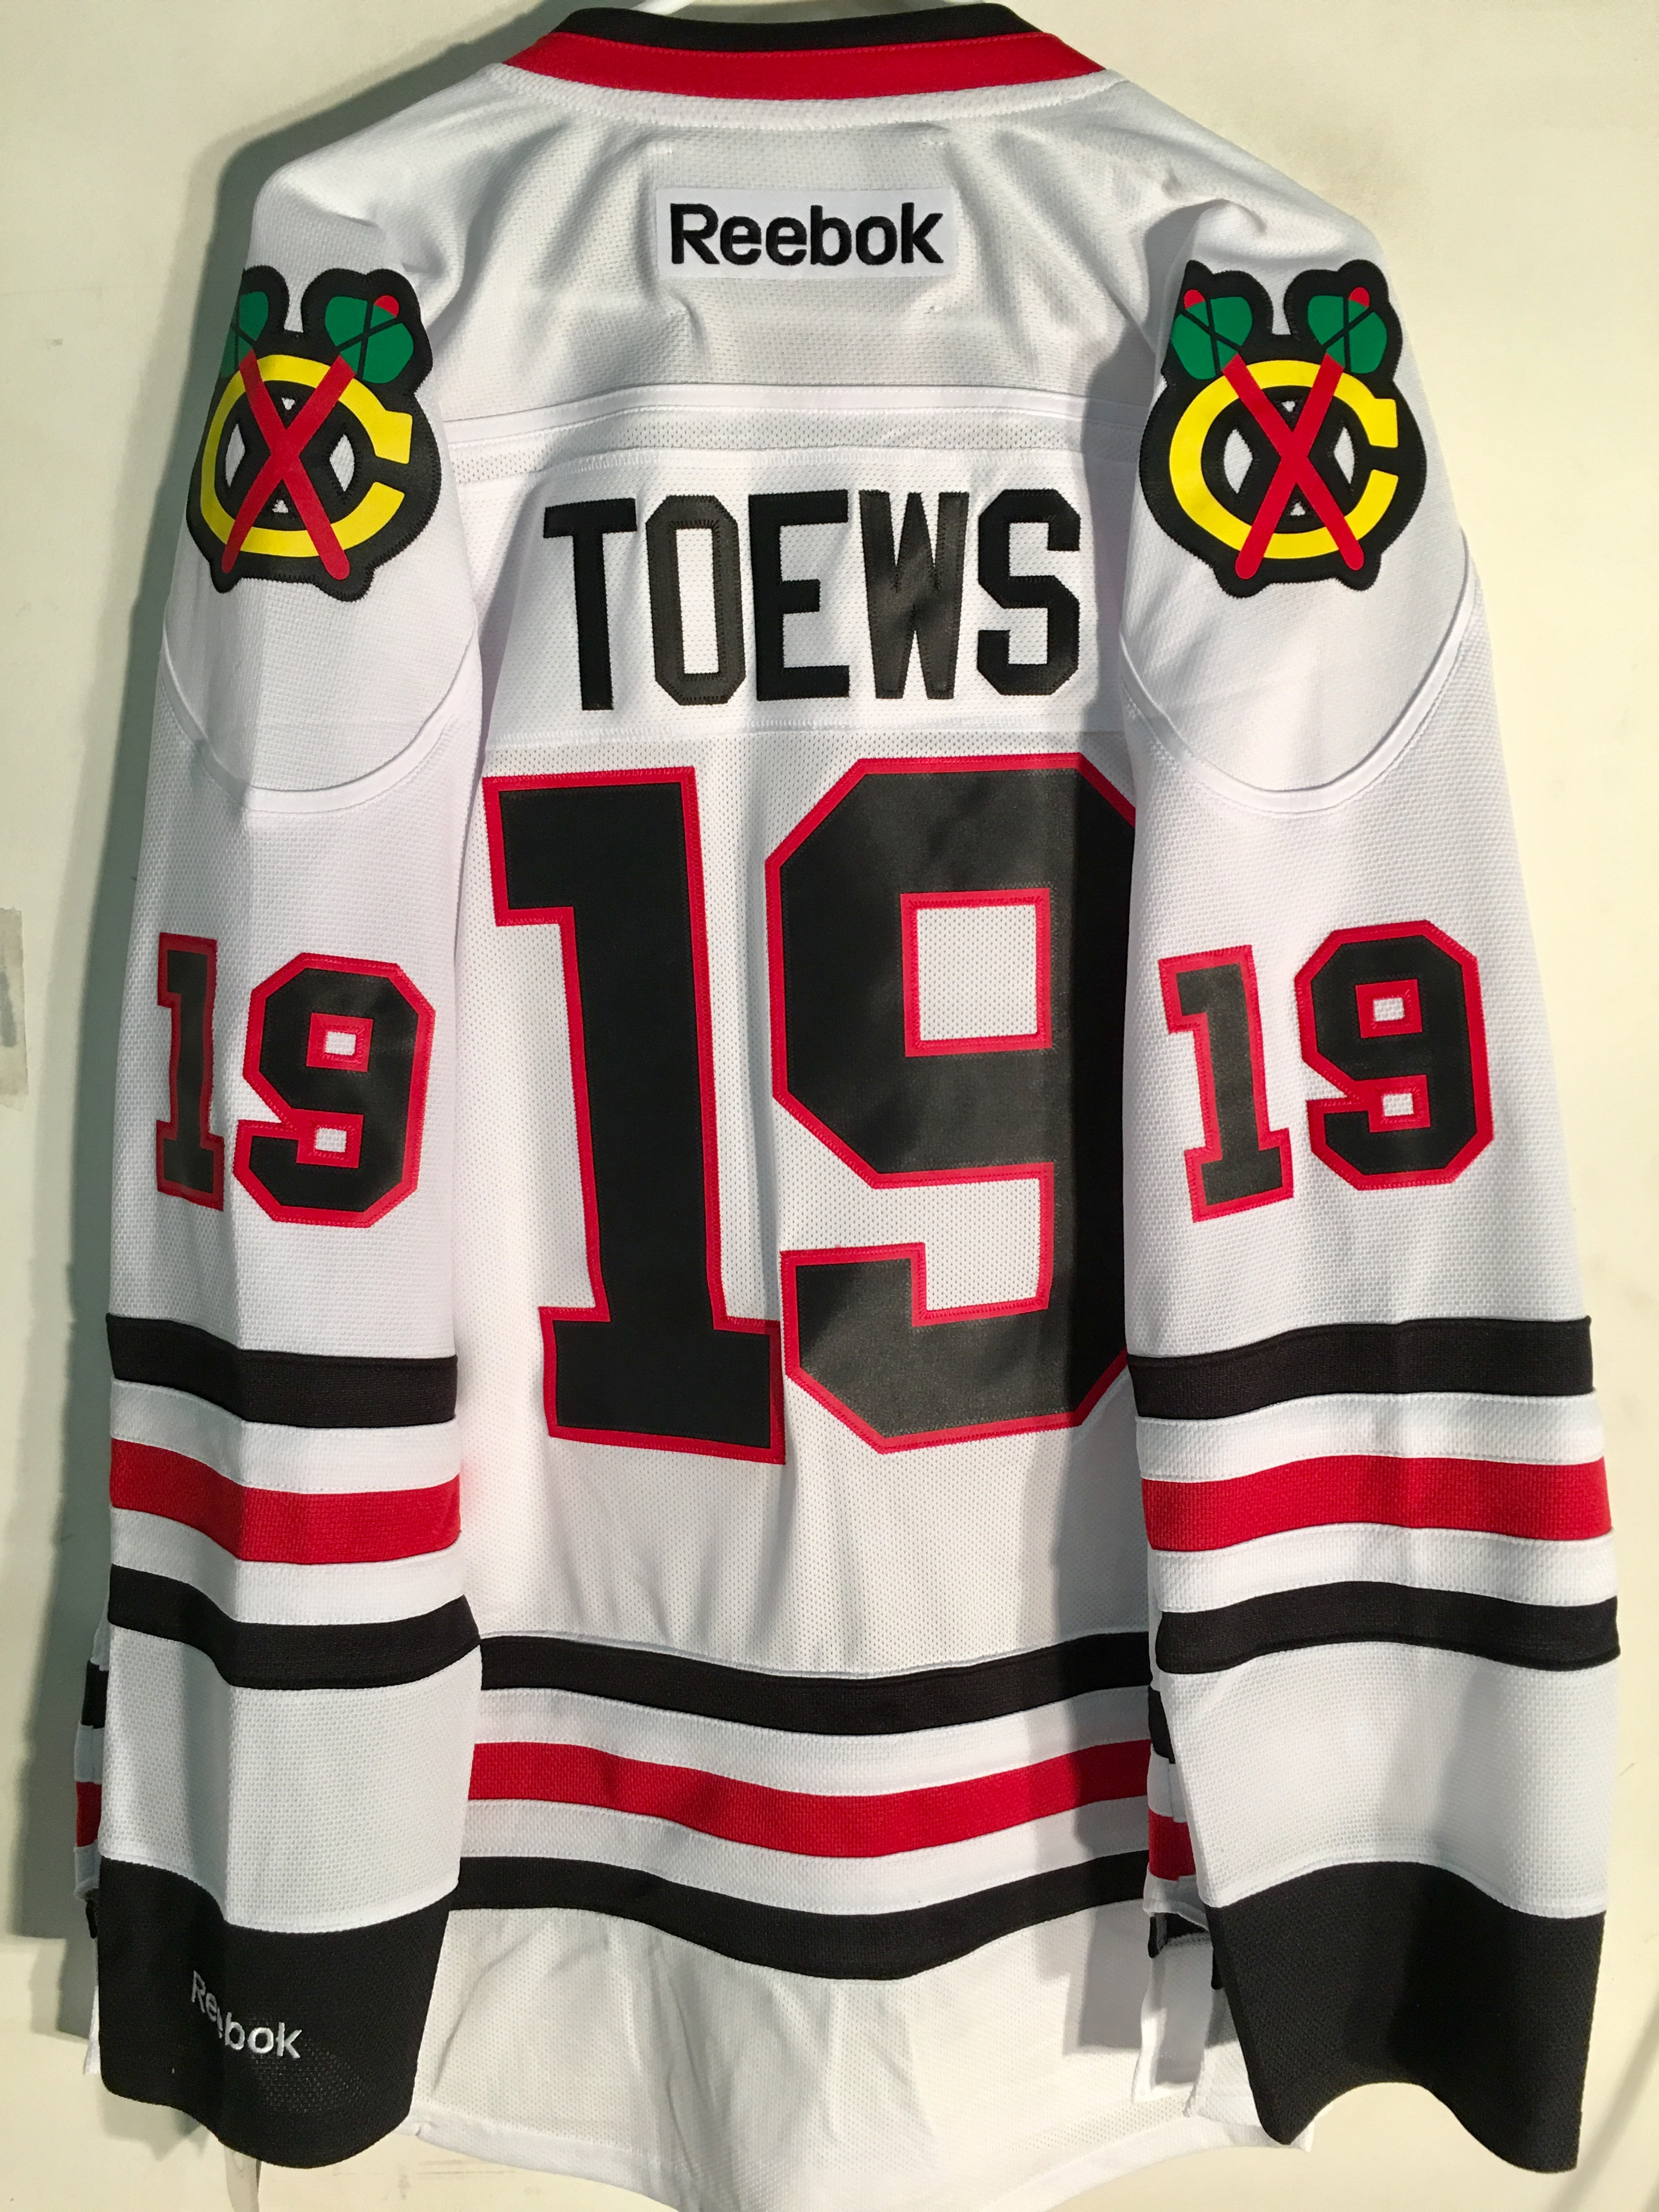 7da9150d Reebok Premier NHL Jersey Chicago Blackhawks Jonathan Toews White sz ...